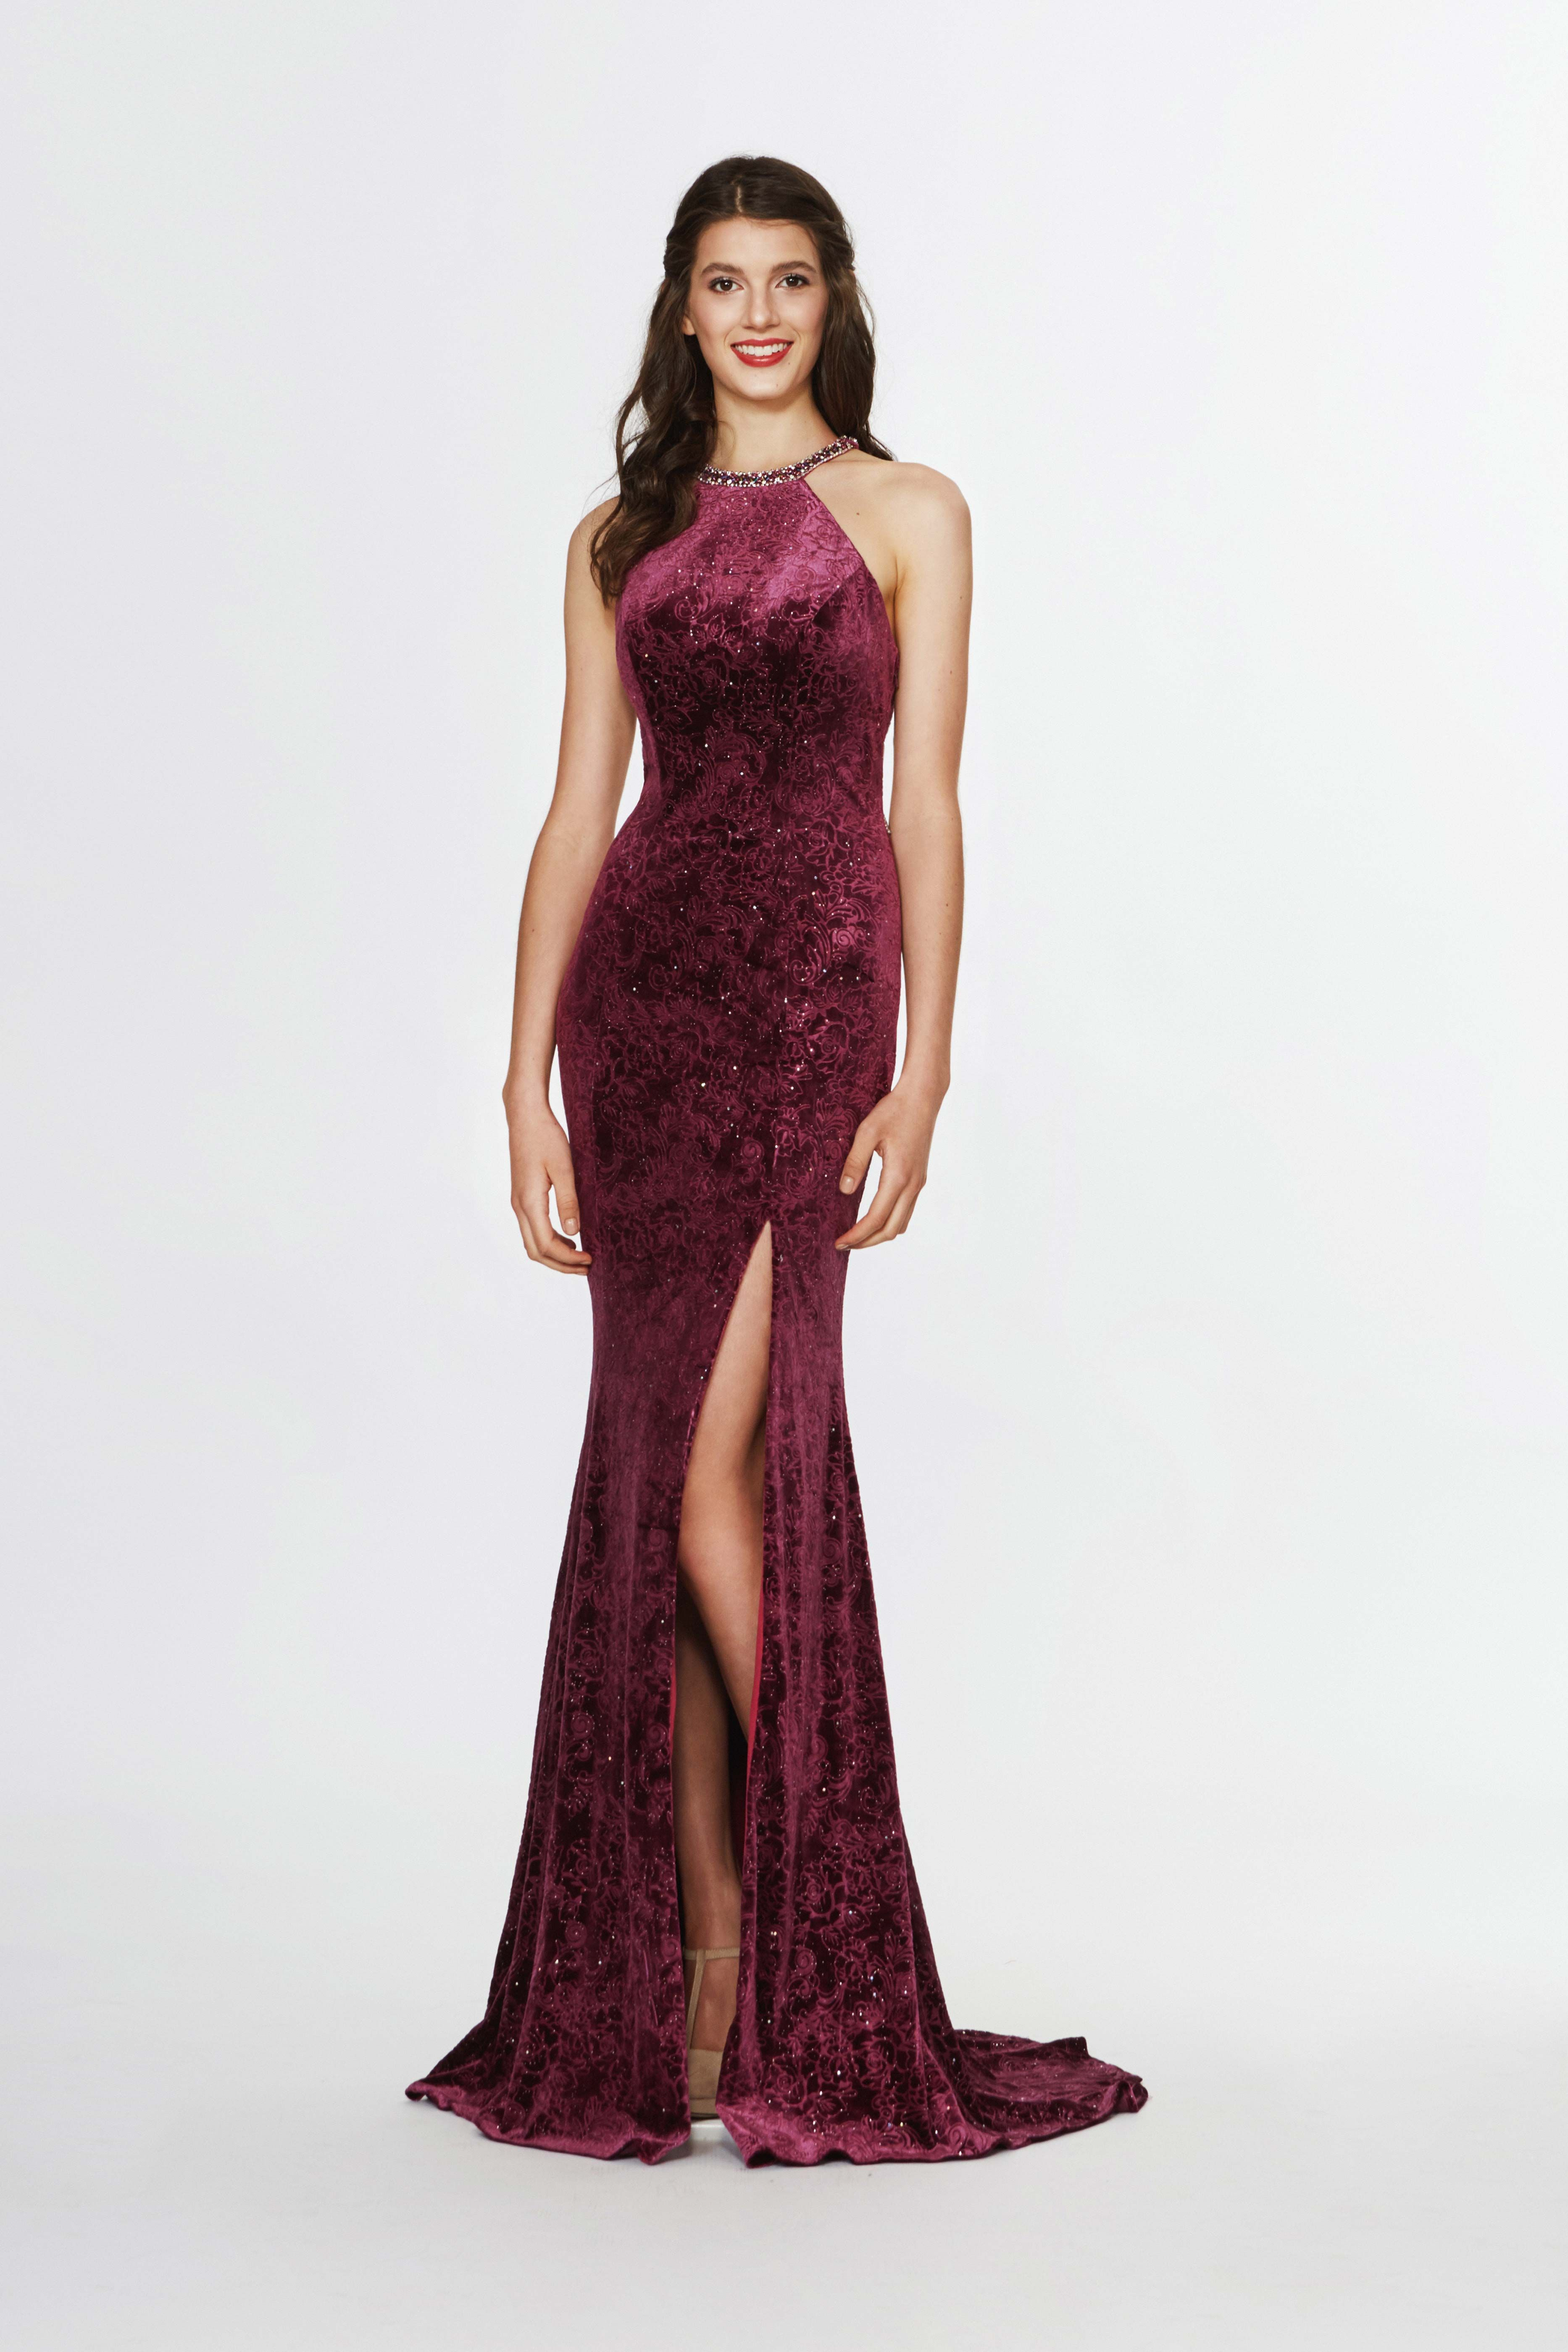 Angela Alison Style 91054 In Wine Beautiful Prom Dresses Dresses Sleeveless Formal Dress [ 5597 x 3732 Pixel ]